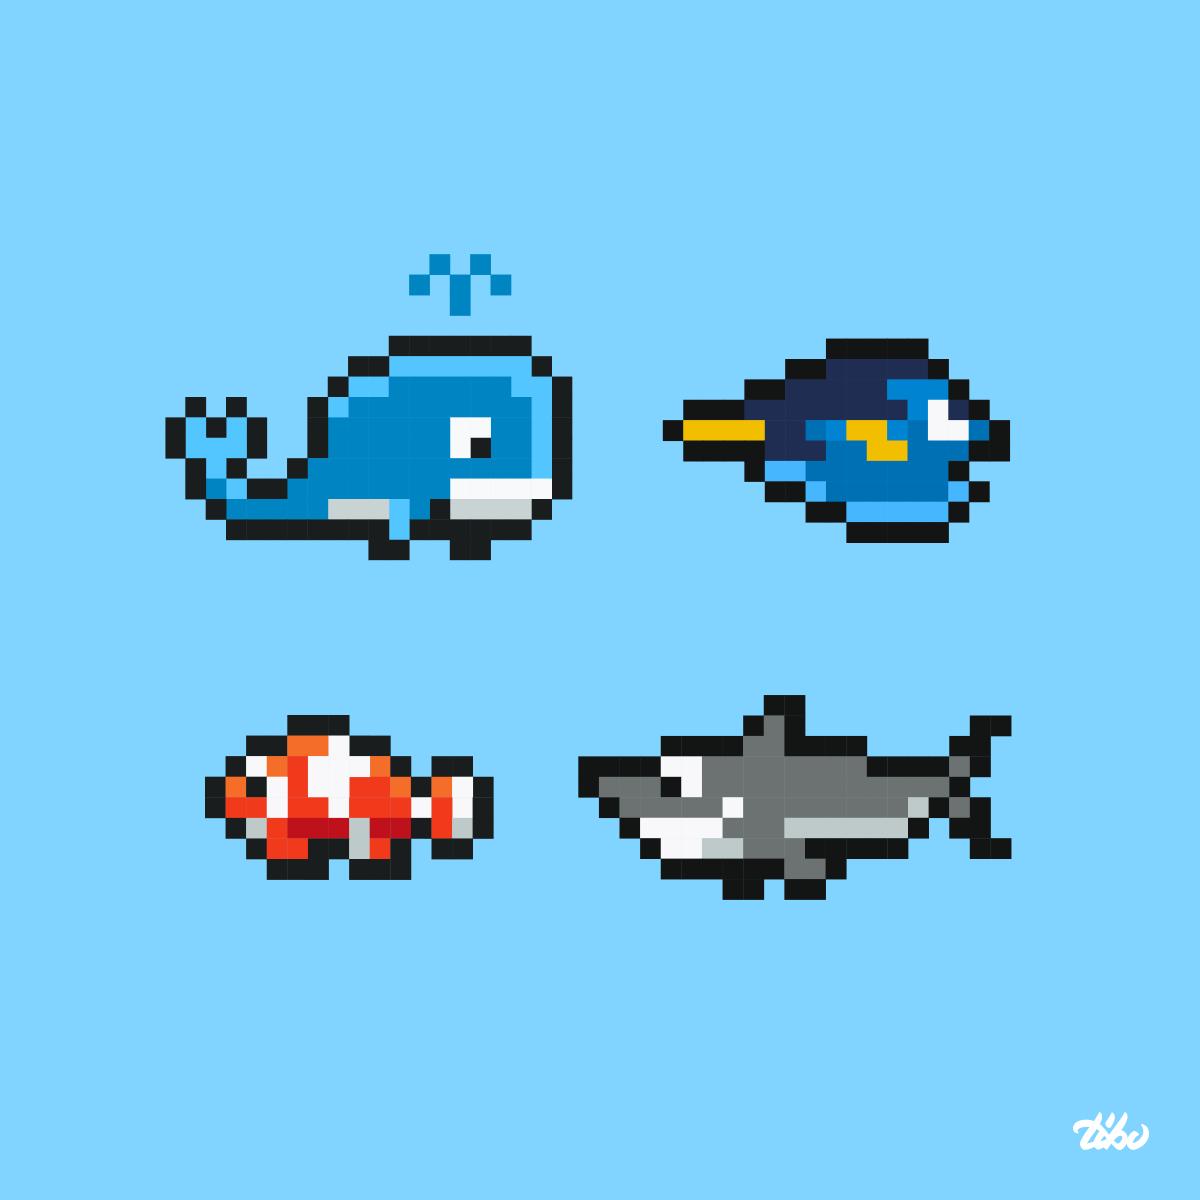 Animaux marins pixel-art